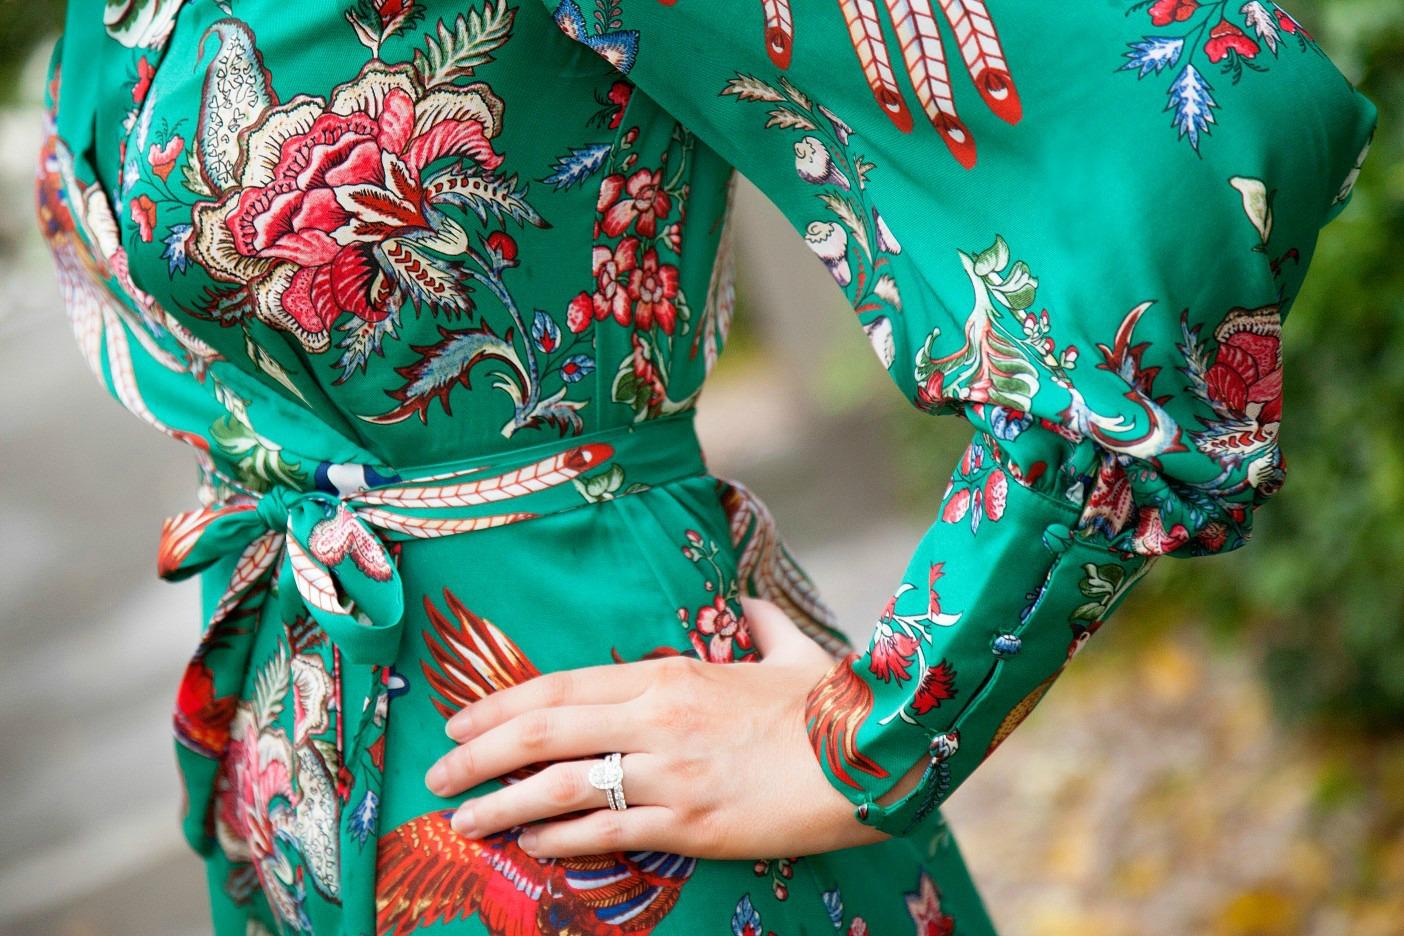 silk pajama print green emerald dress fashion blogger outfit ideas chanel flap handbag lauren slade style elixir 5.